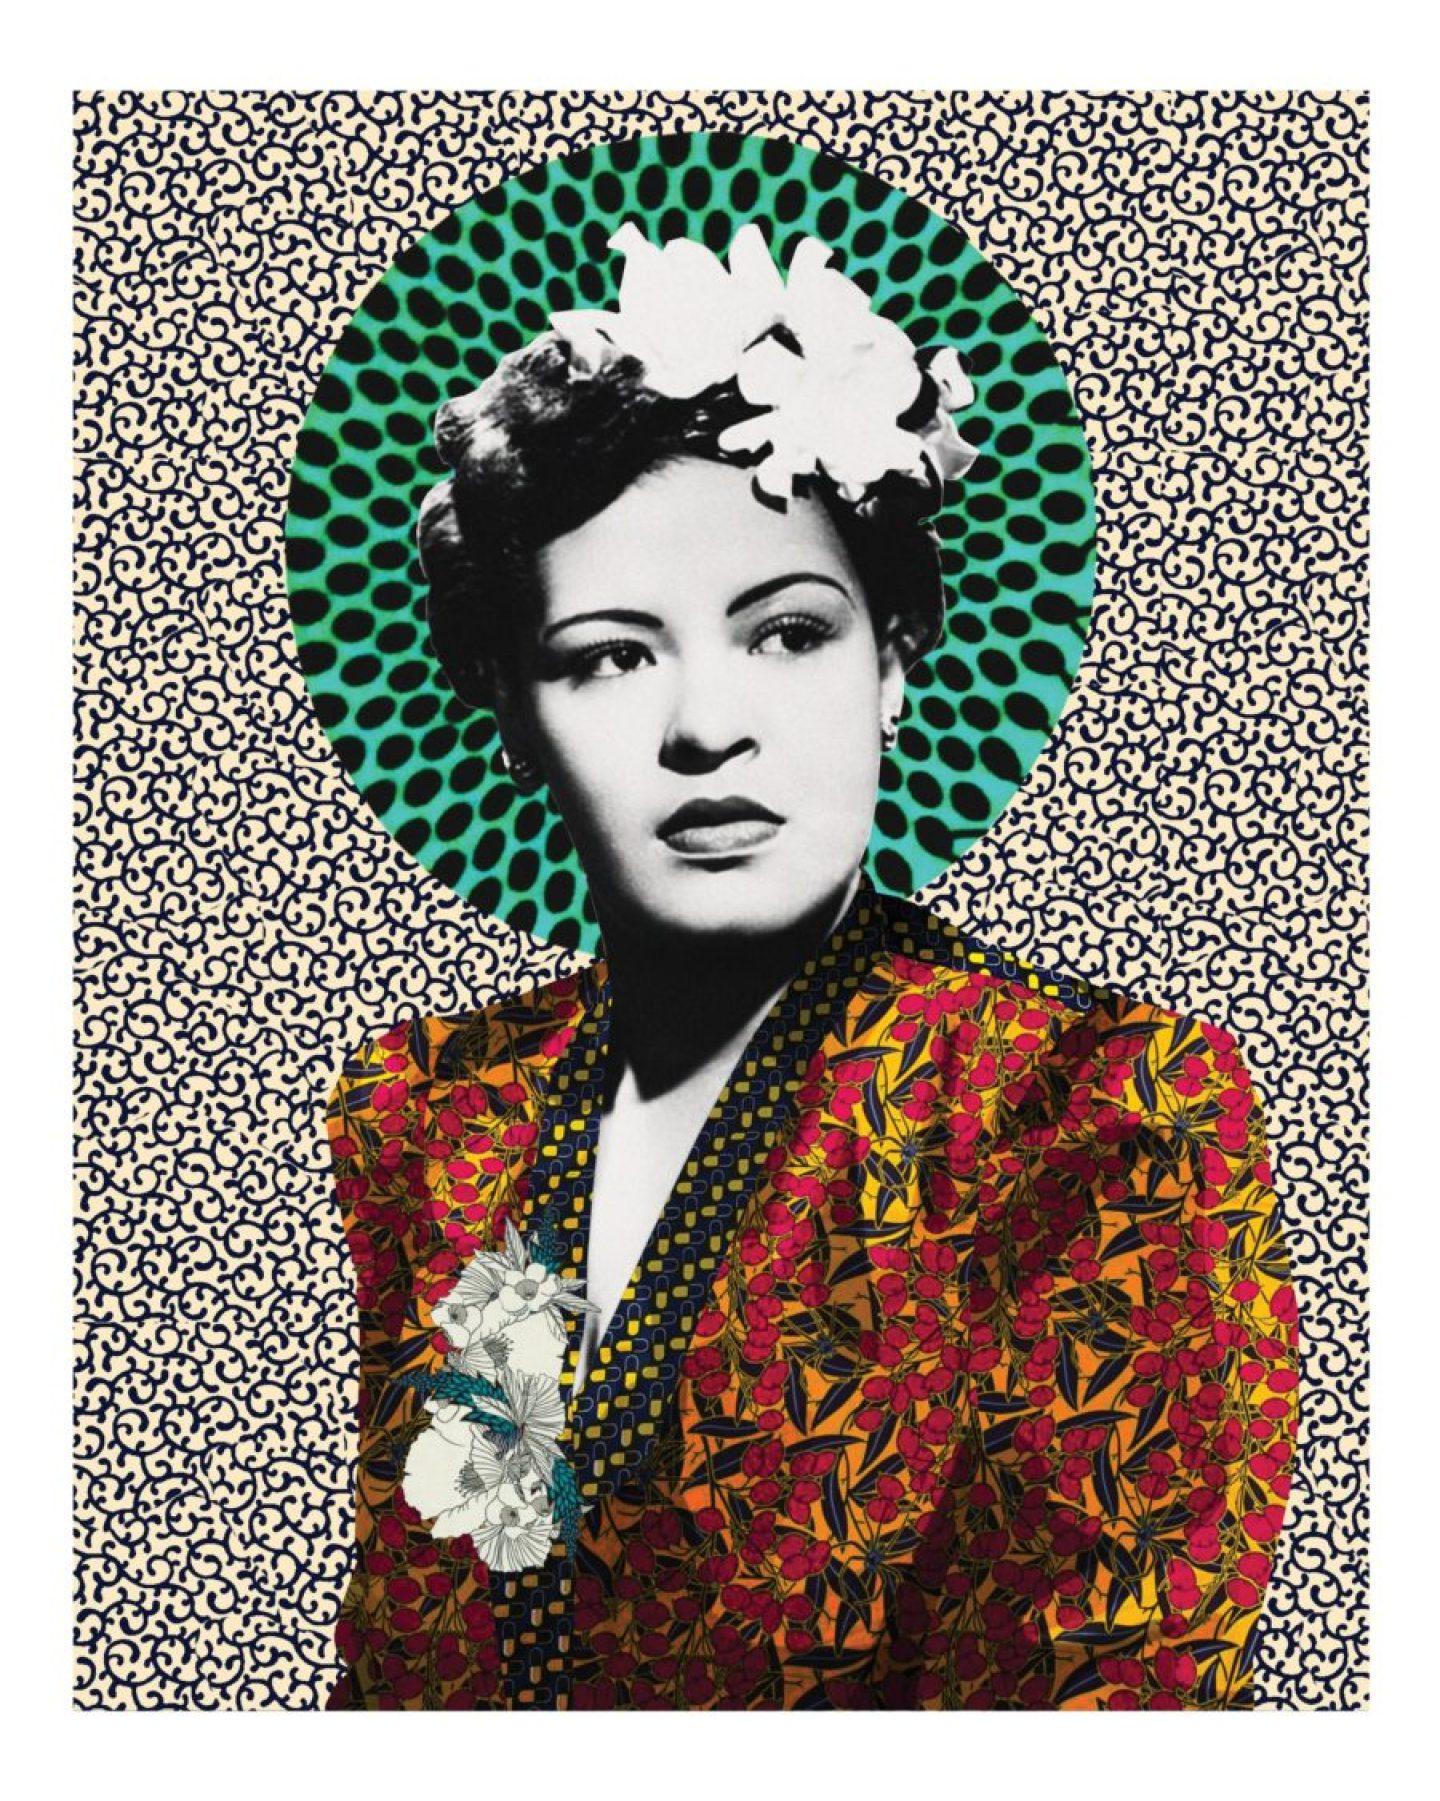 Original-Ms.-Billie-by-Makeba-KEEBS-Rainey_noframe-1440x1801 Makeeba KEEBS Rainey Art Featured in Absolut Art